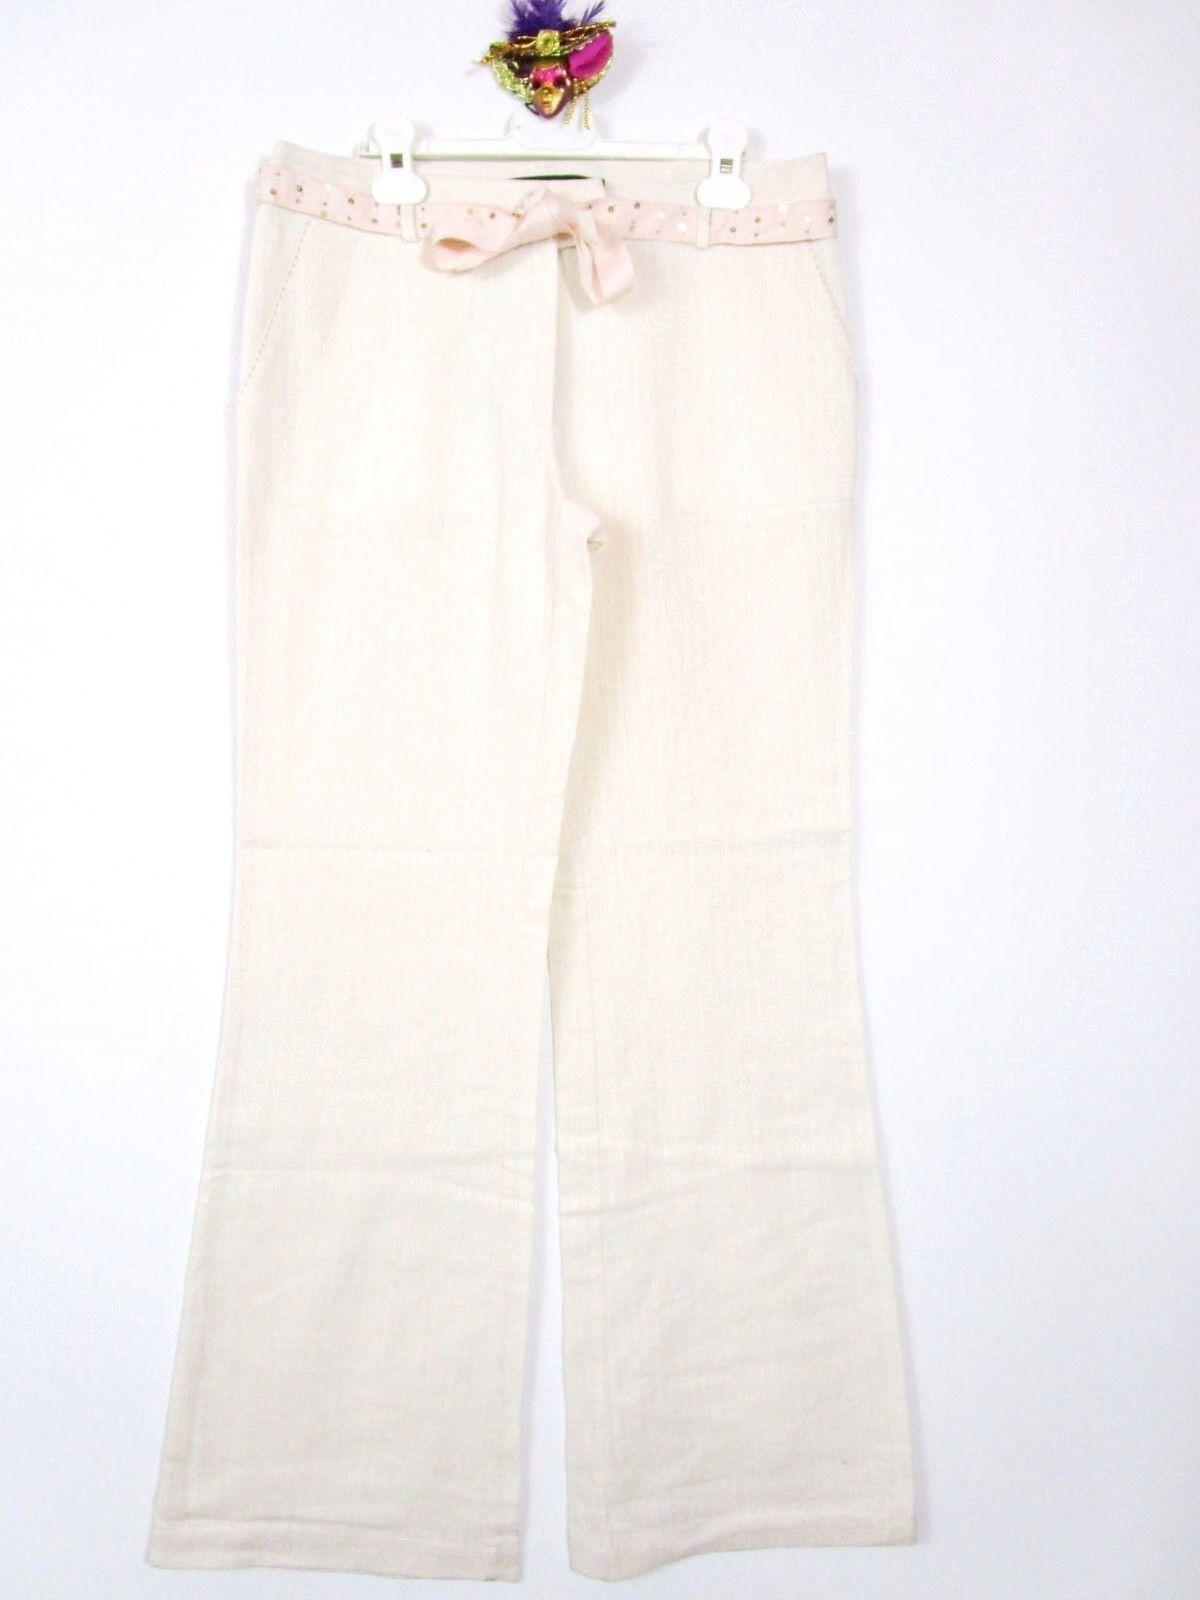 Malou Sander Muus damen damen damen Danish Design Fashion Linen Cotton Trousers sz 38 AZ12 e453d8